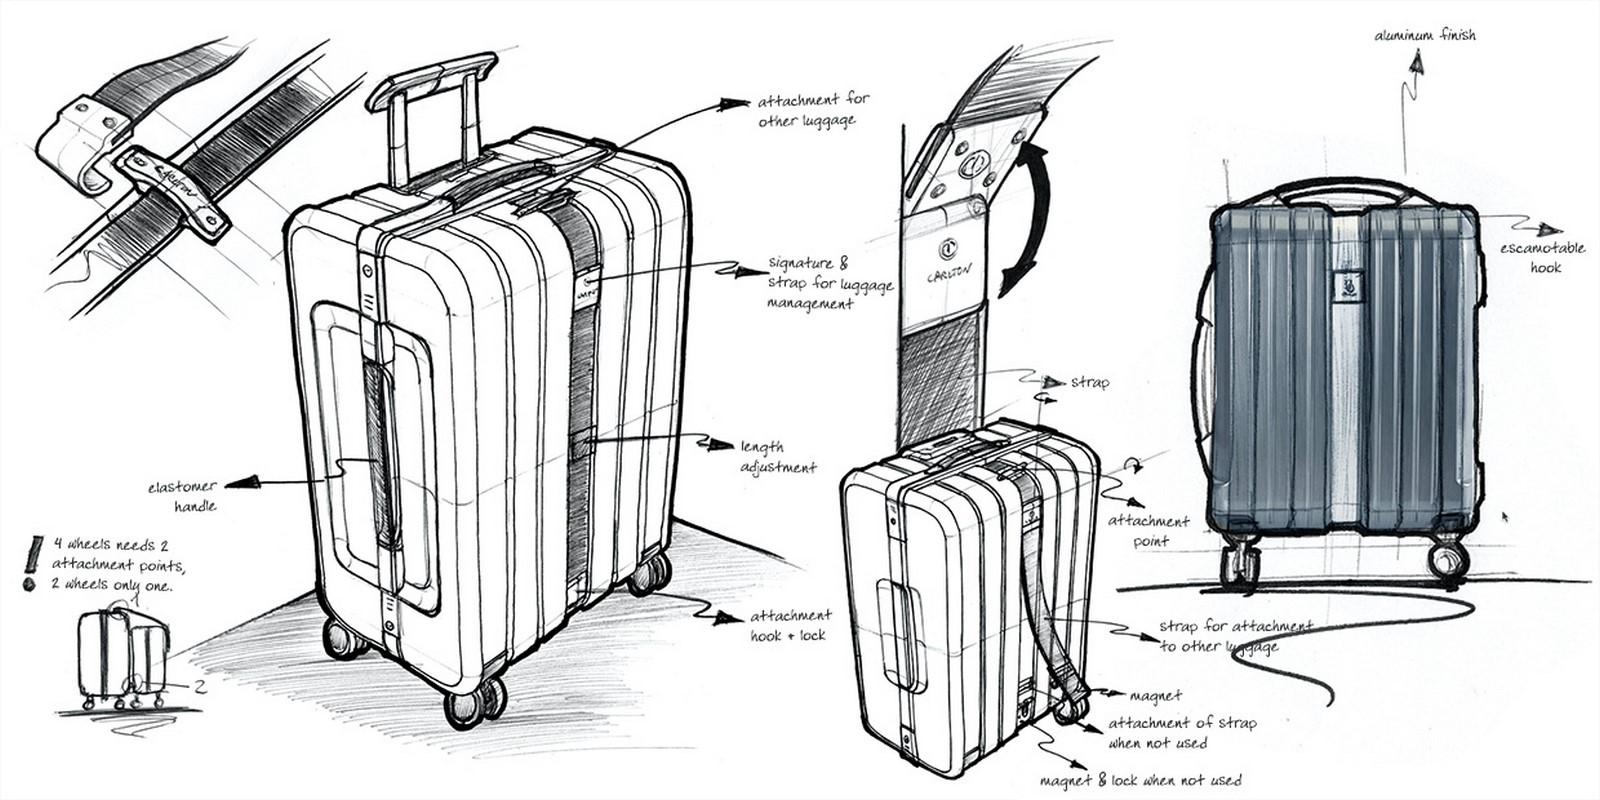 Sequoia-studio- 10 Iconic Products - Sheet30